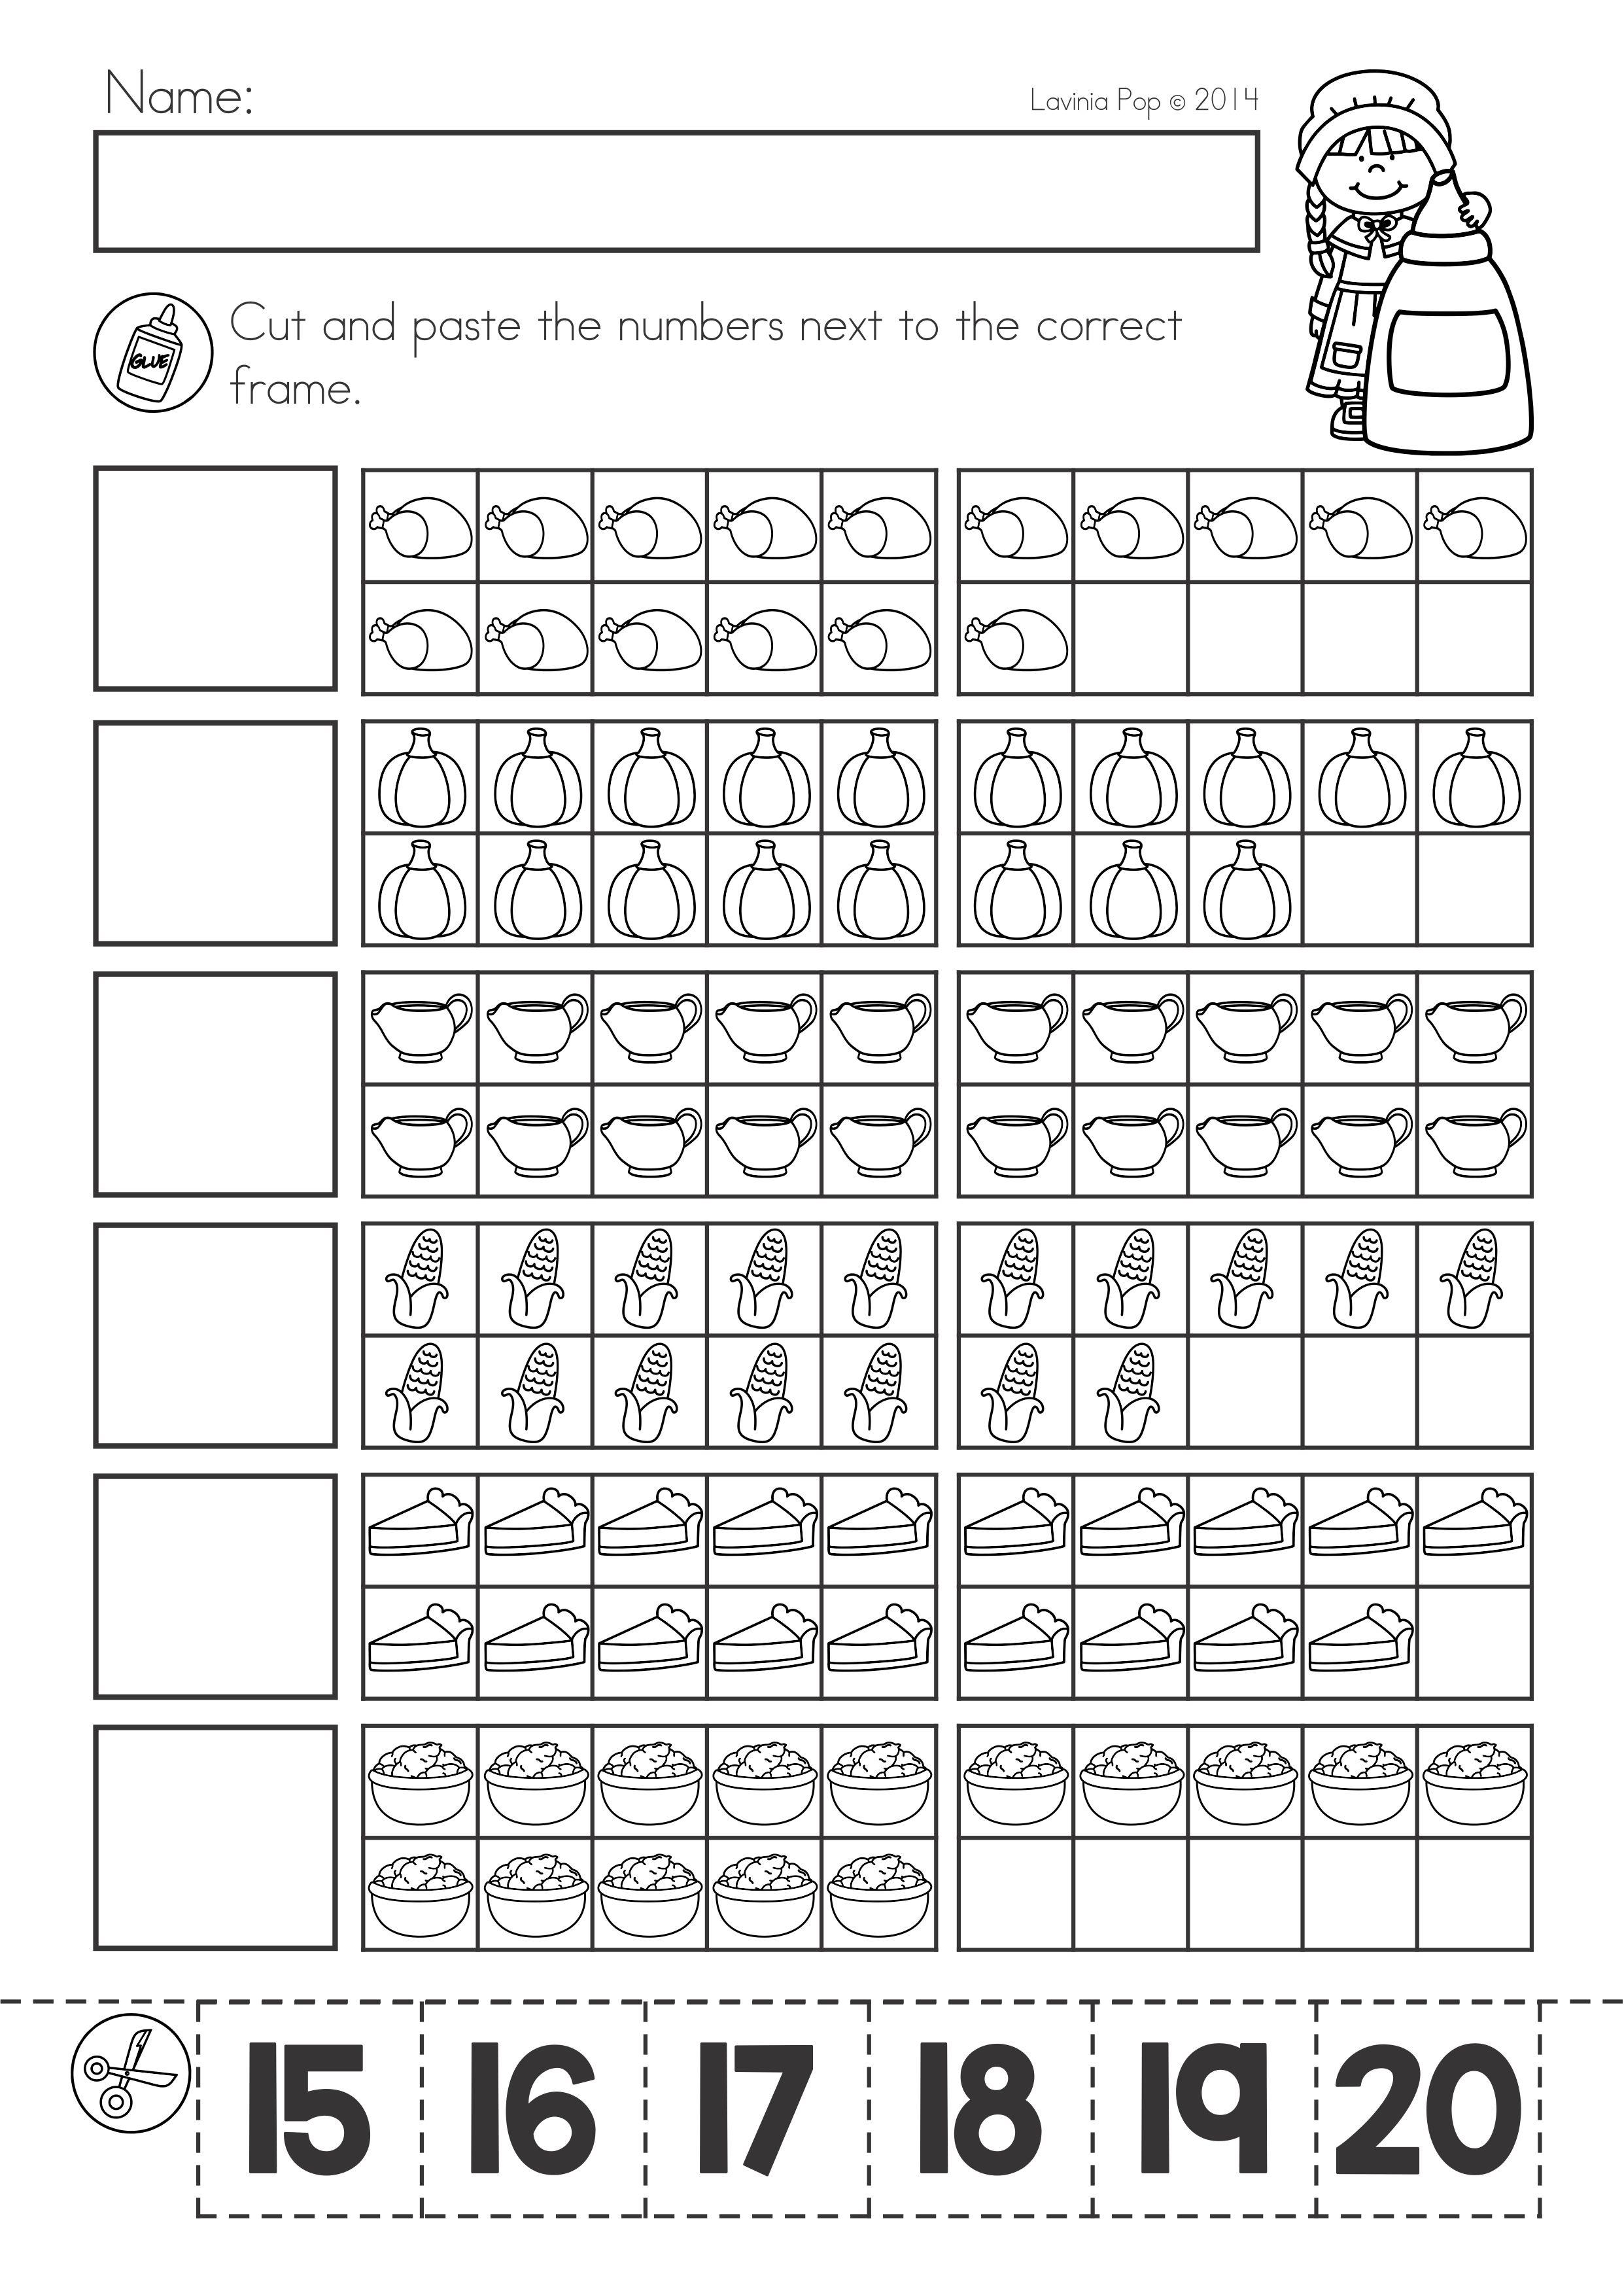 Thanksgiving Math Literacy Worksheets And Activities For Kindergarten Match Th Kindergarten Math Worksheets Literacy Worksheets Thanksgiving Math Worksheets